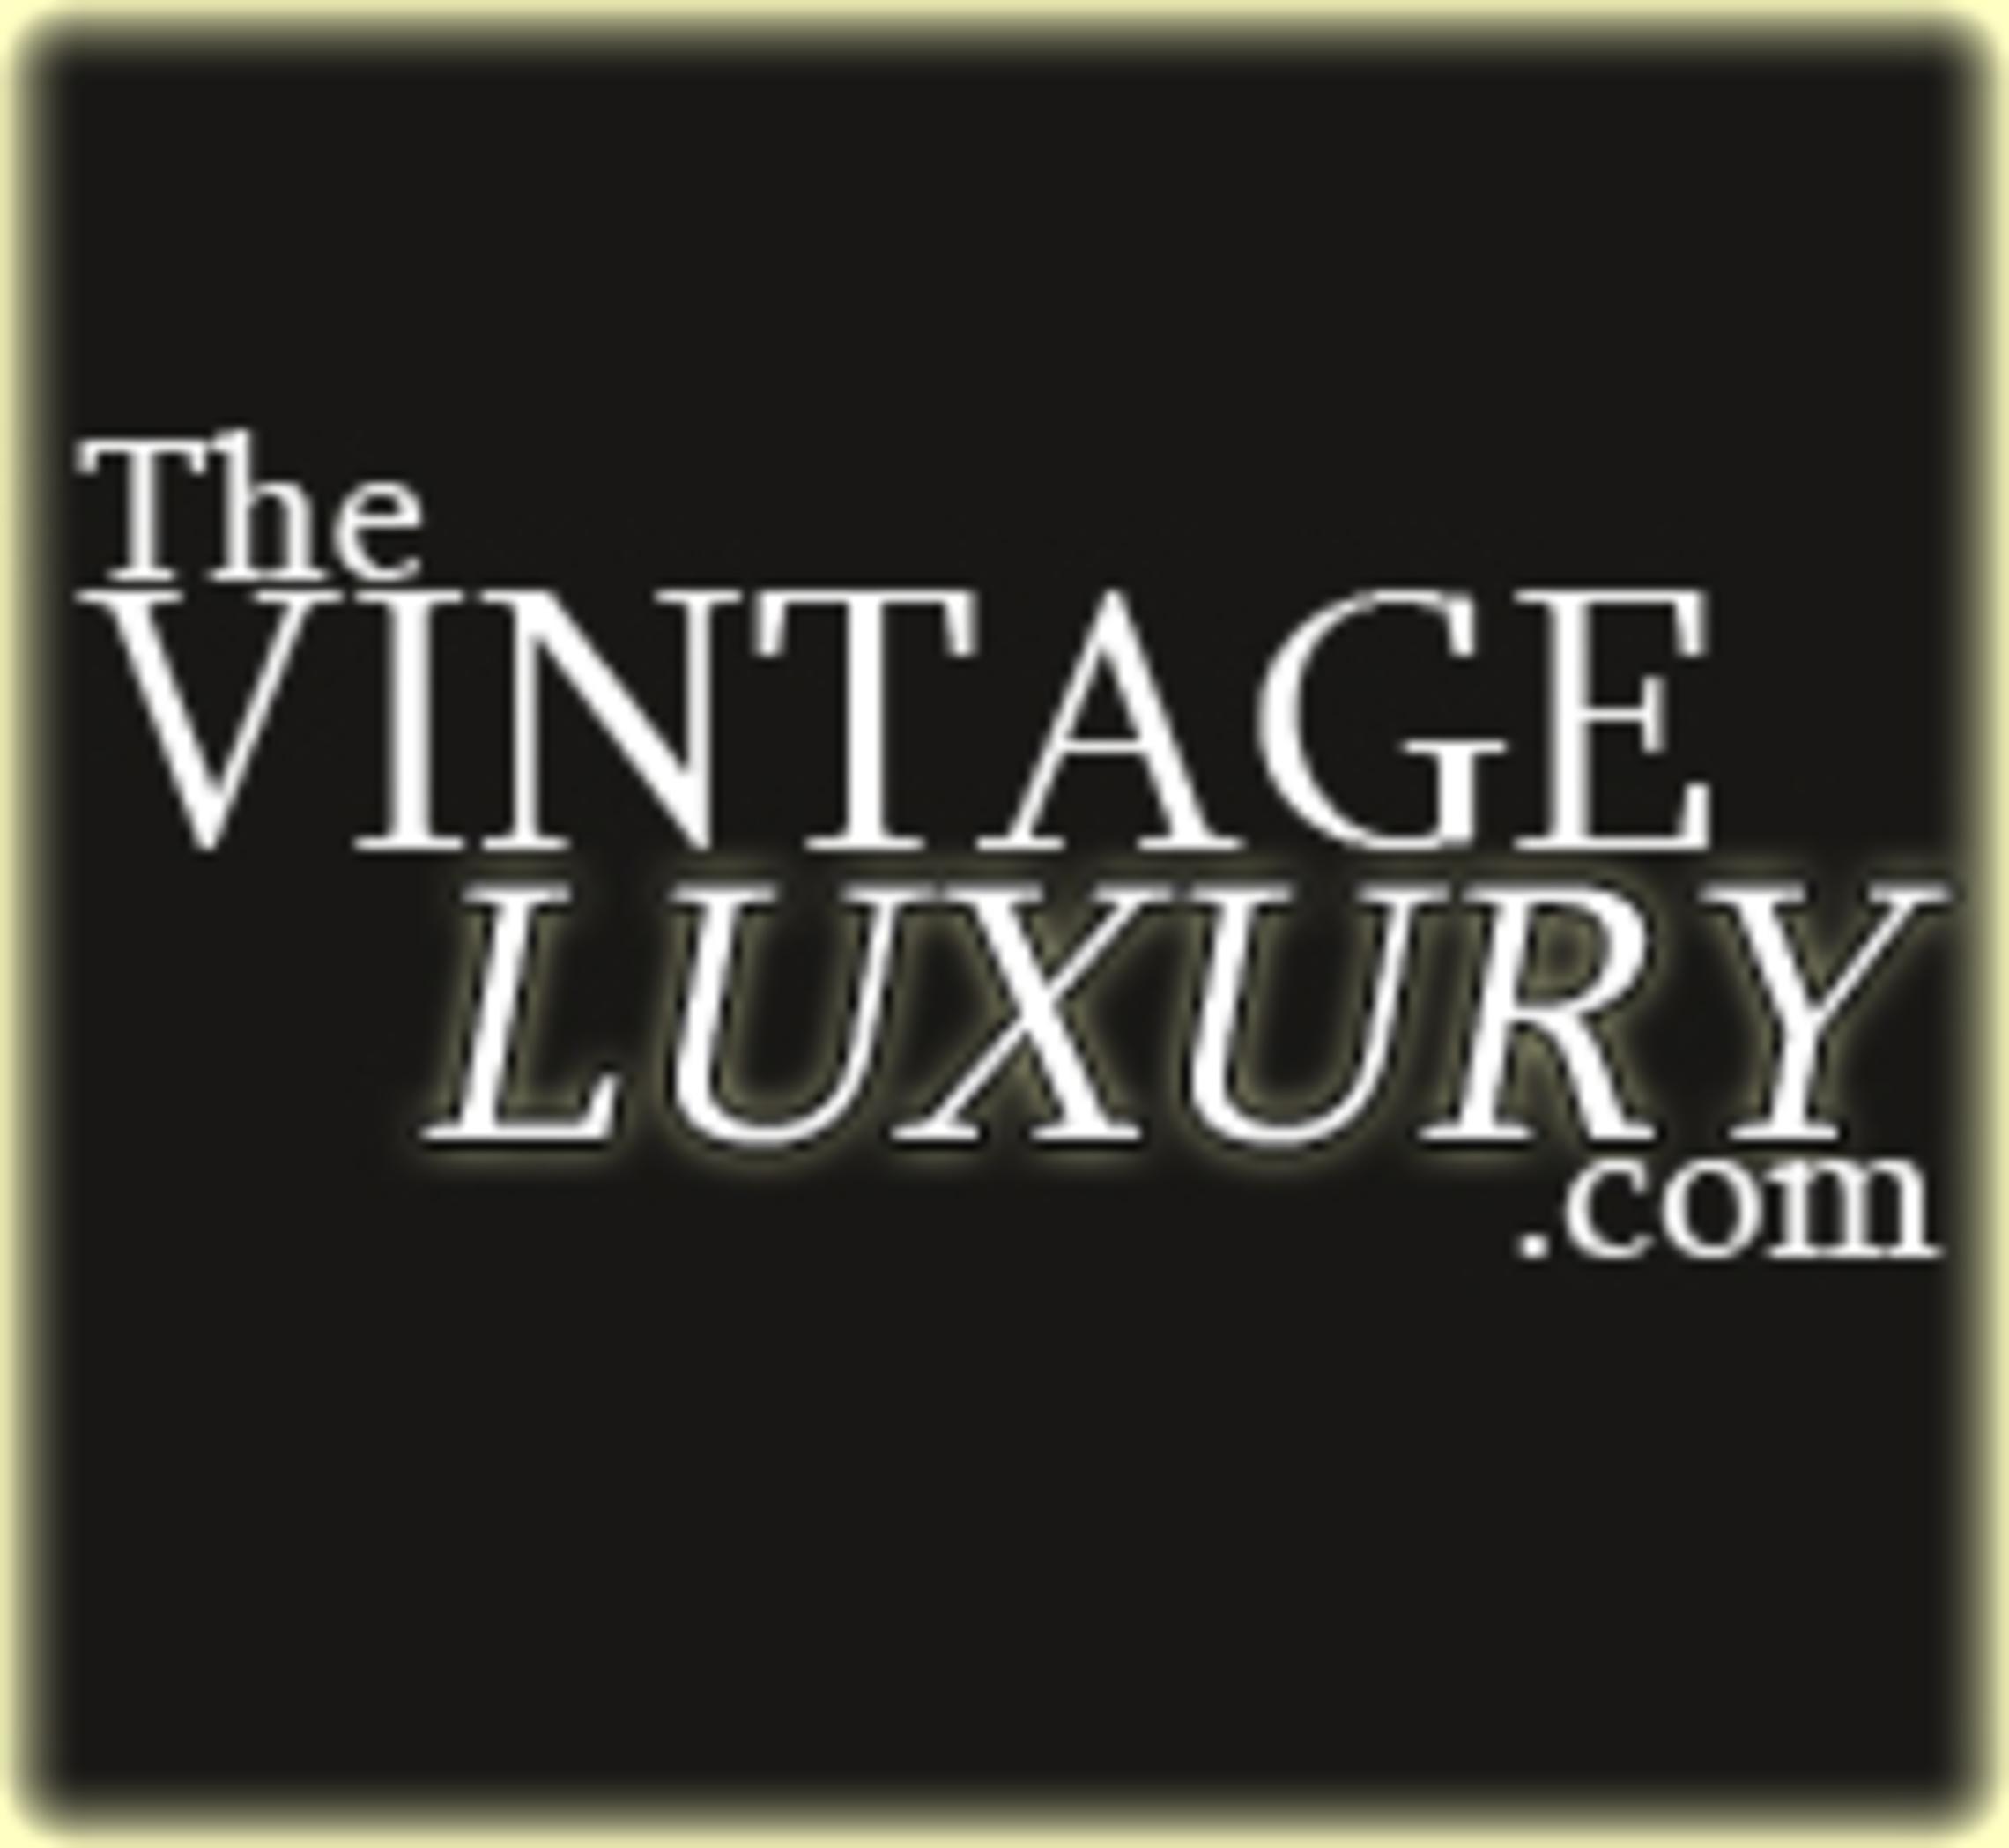 the vintage luxury- company logo